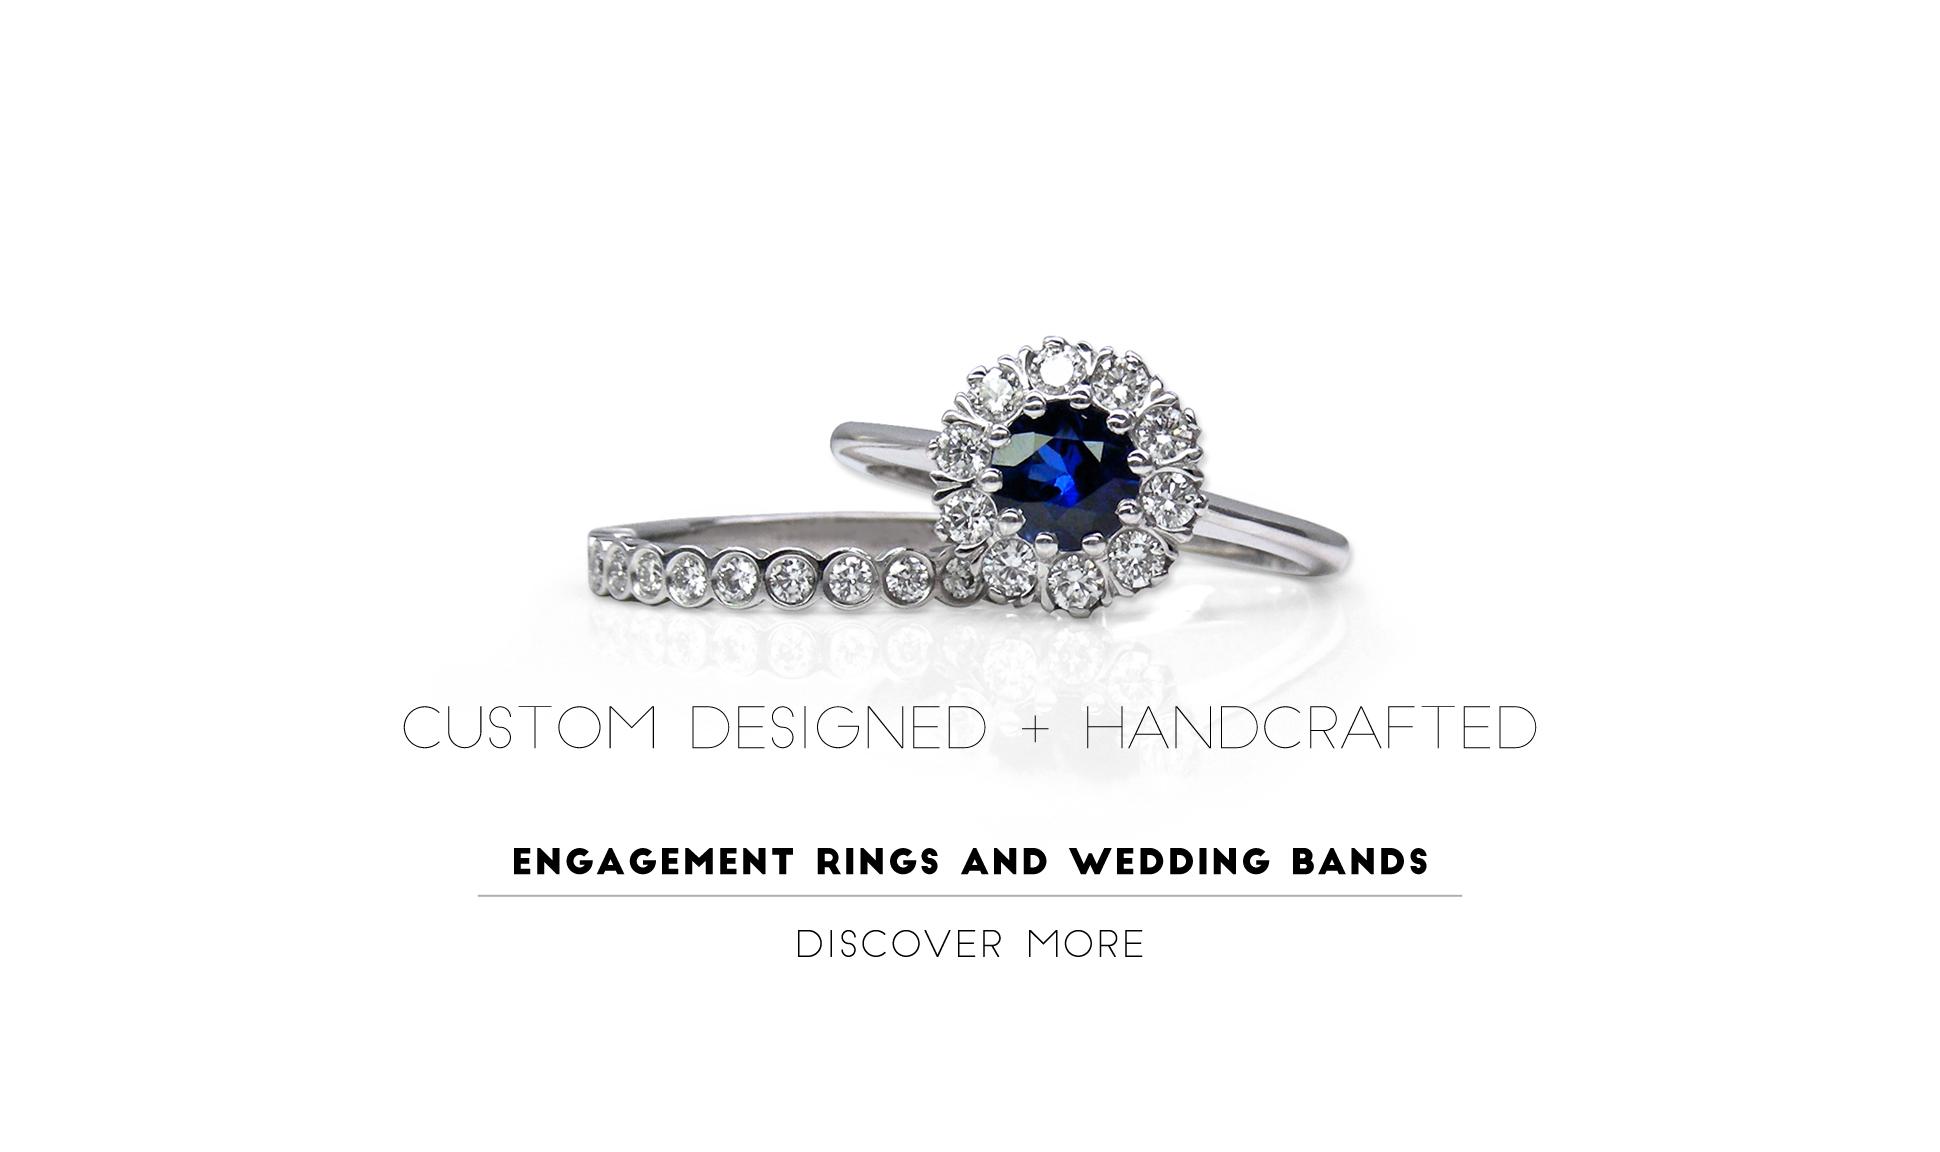 18Karat's Toronto Custom Jewellery, Custom engagement rings and wedding bands